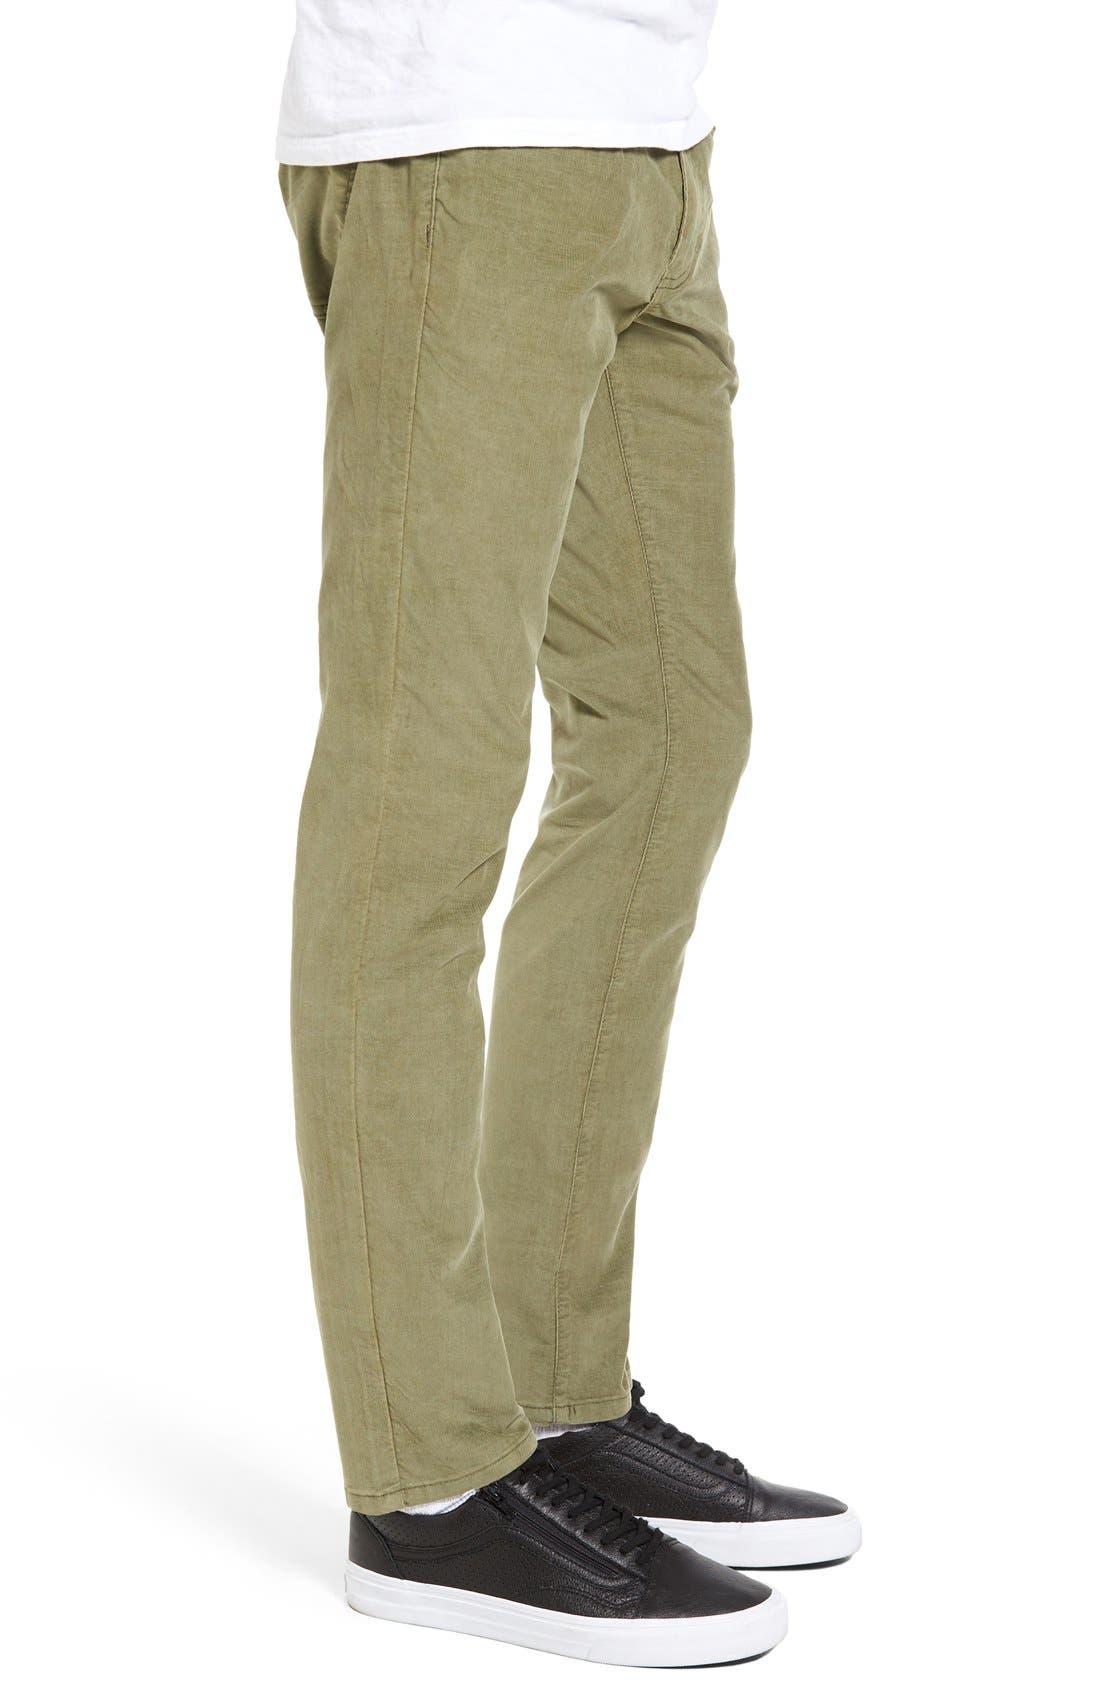 Bryce Chopper Slim Fit Corduroy Pants,                             Alternate thumbnail 8, color,                             302